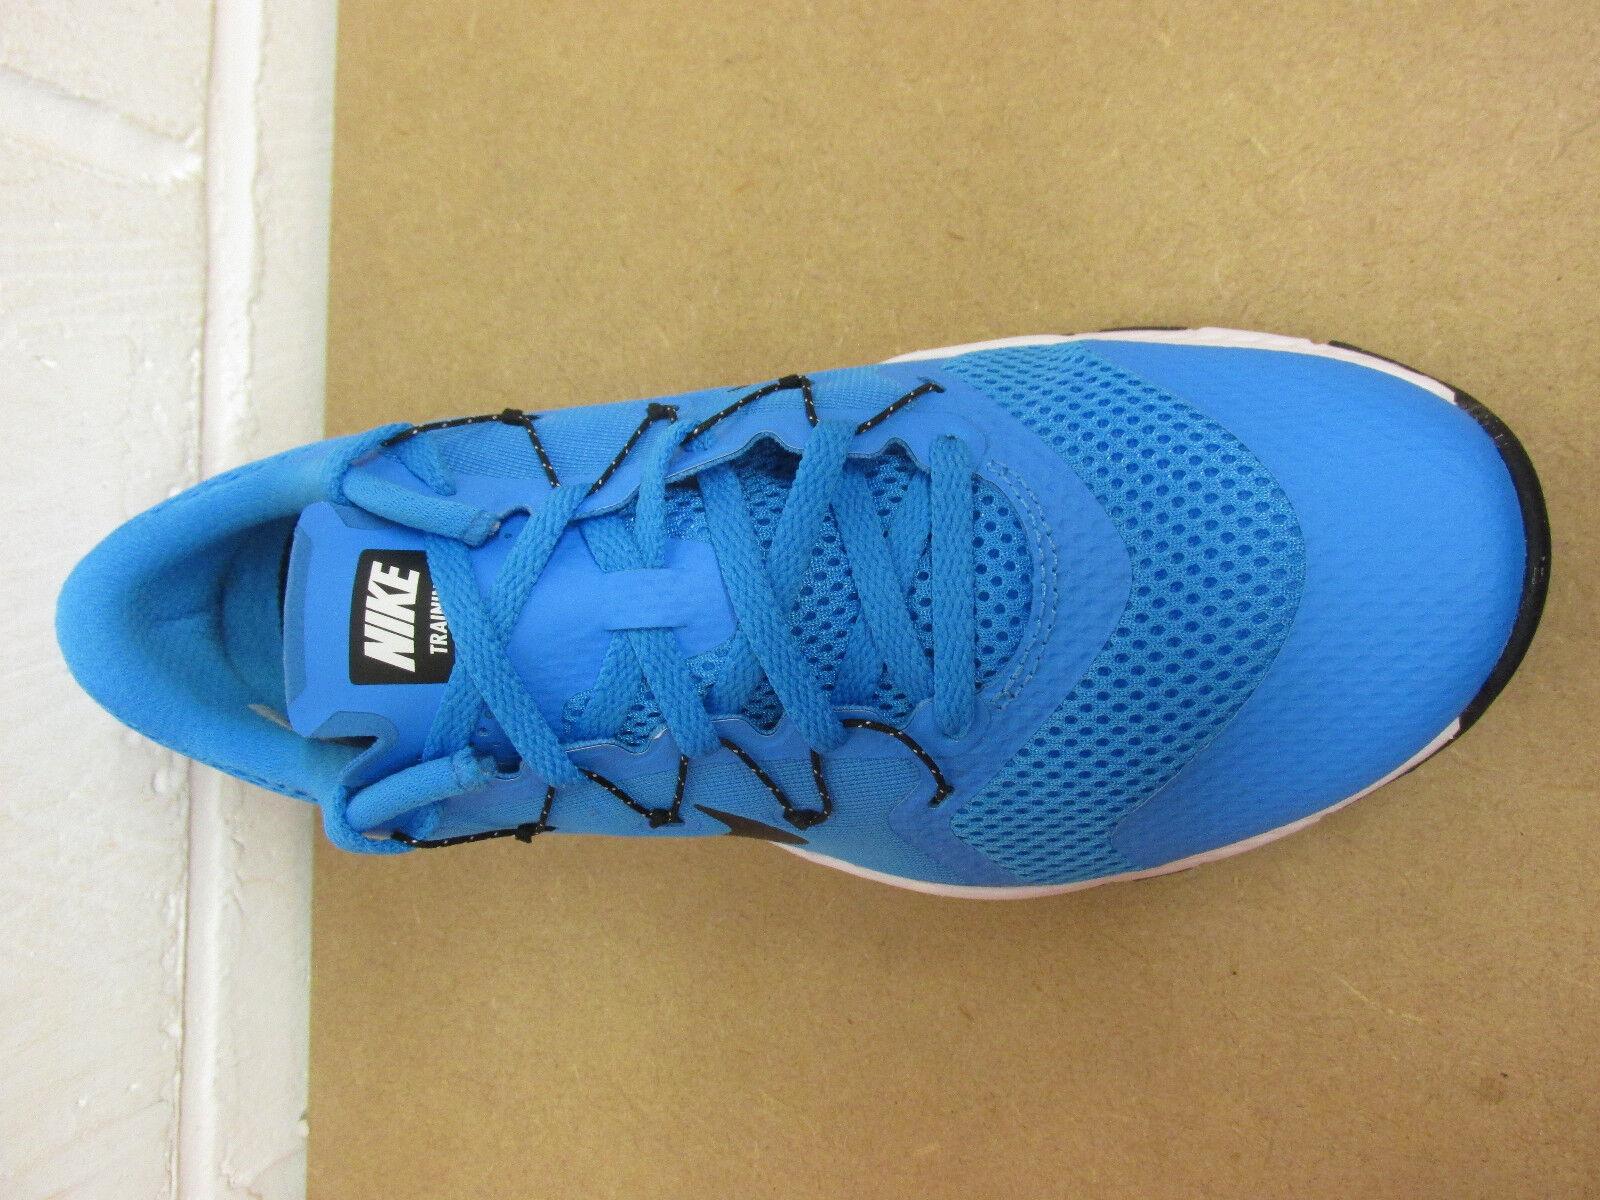 nike air zoom zug 400 komplett männer laufen 882119 400 zug ausbilder sneakers, schuhe 45ae47